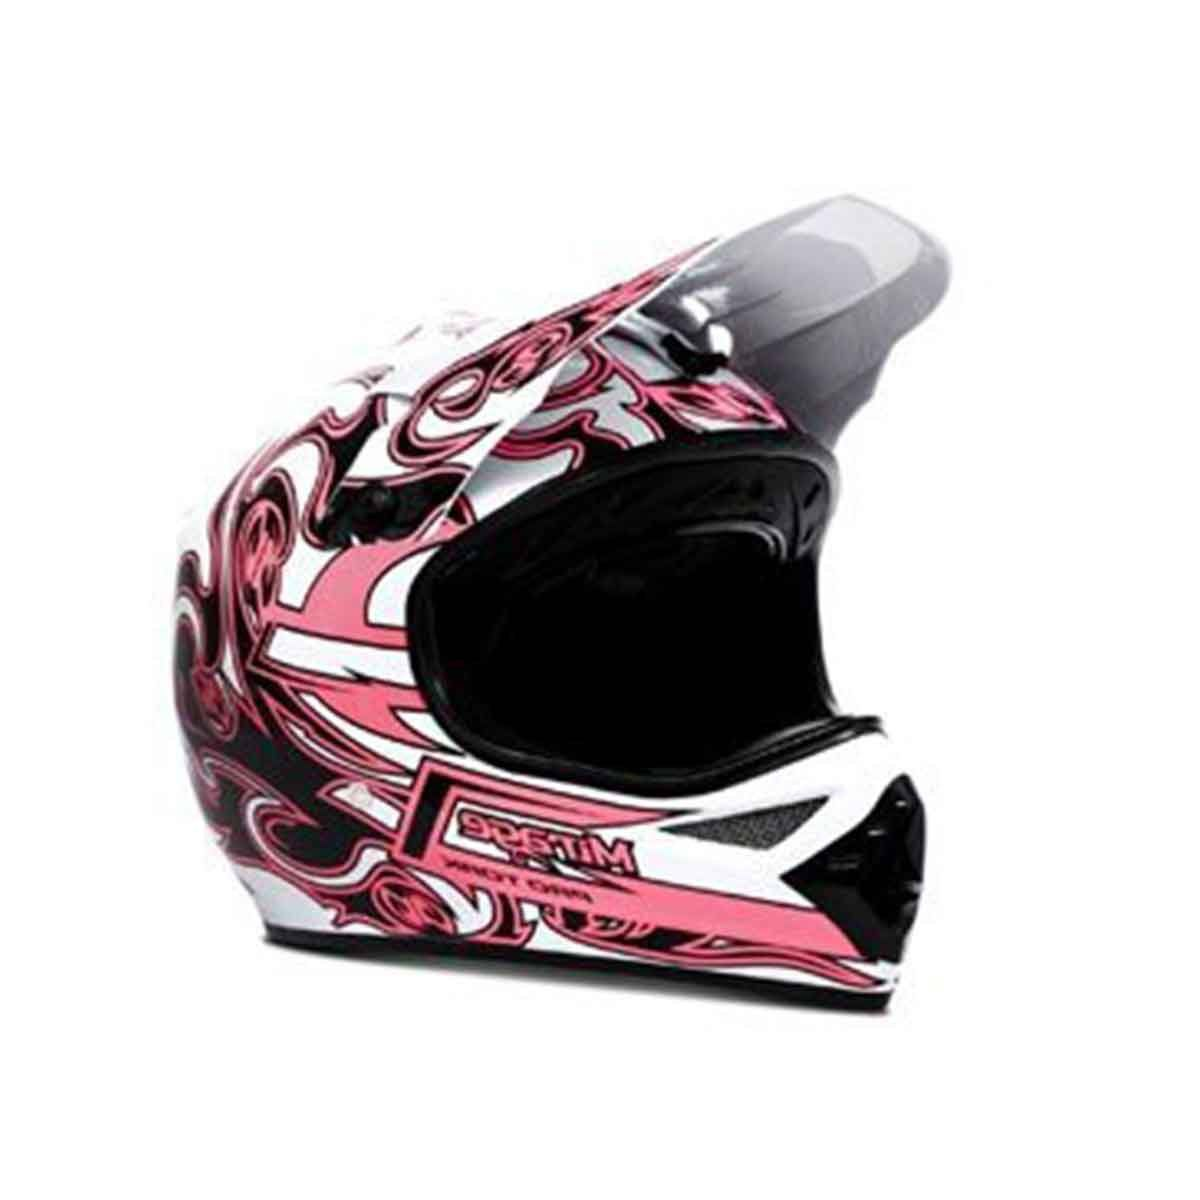 Capacete para Motocross Protork Mirage Rosa